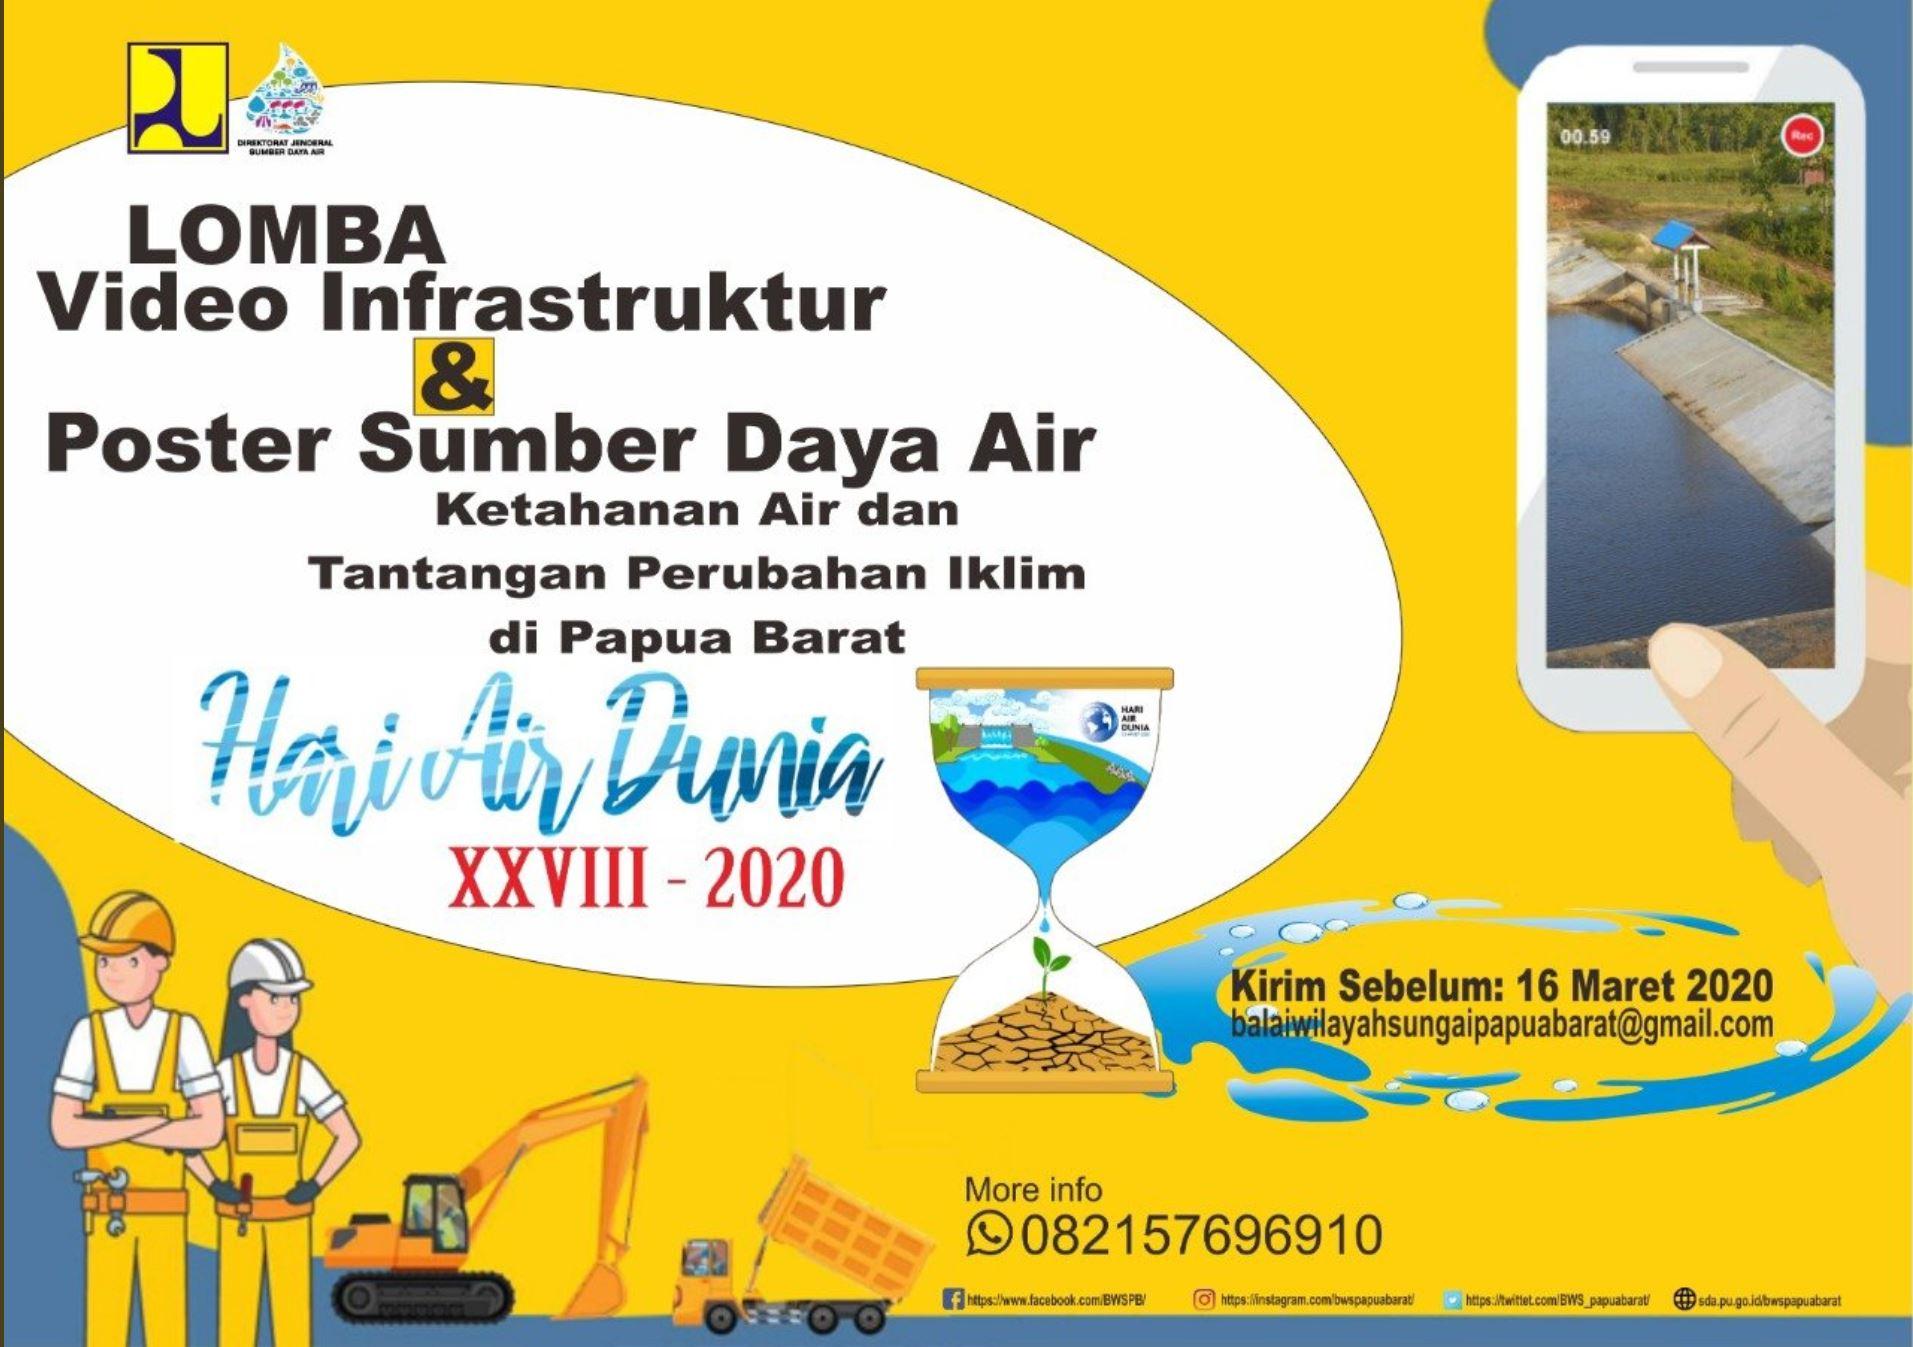 Lomba Video Infrastruktur dan Poster Sumber Daya Air